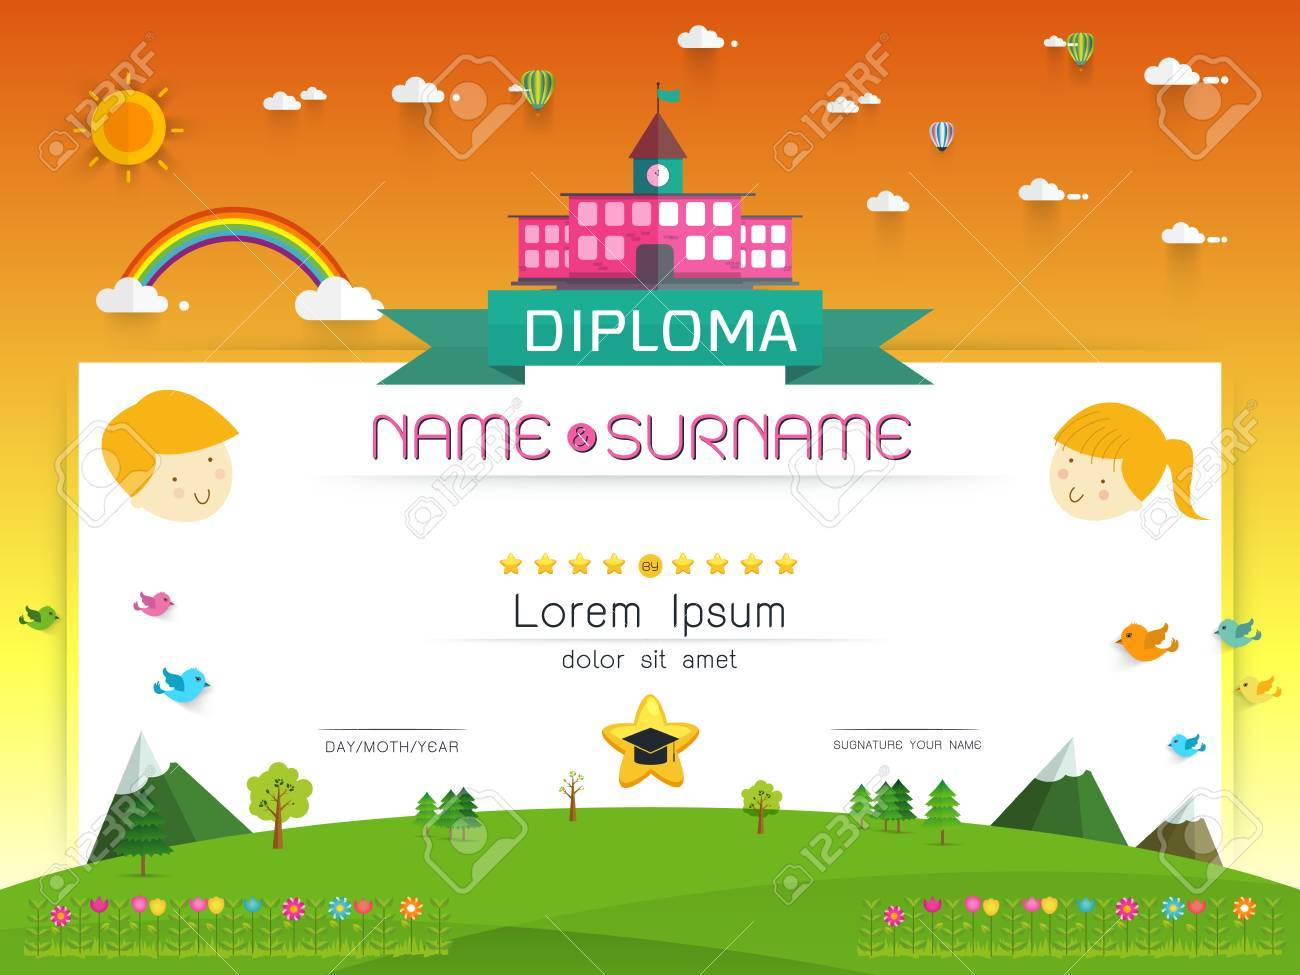 certificate kids diploma kindergarten template layout background frame design illustration preschool elementary school kids